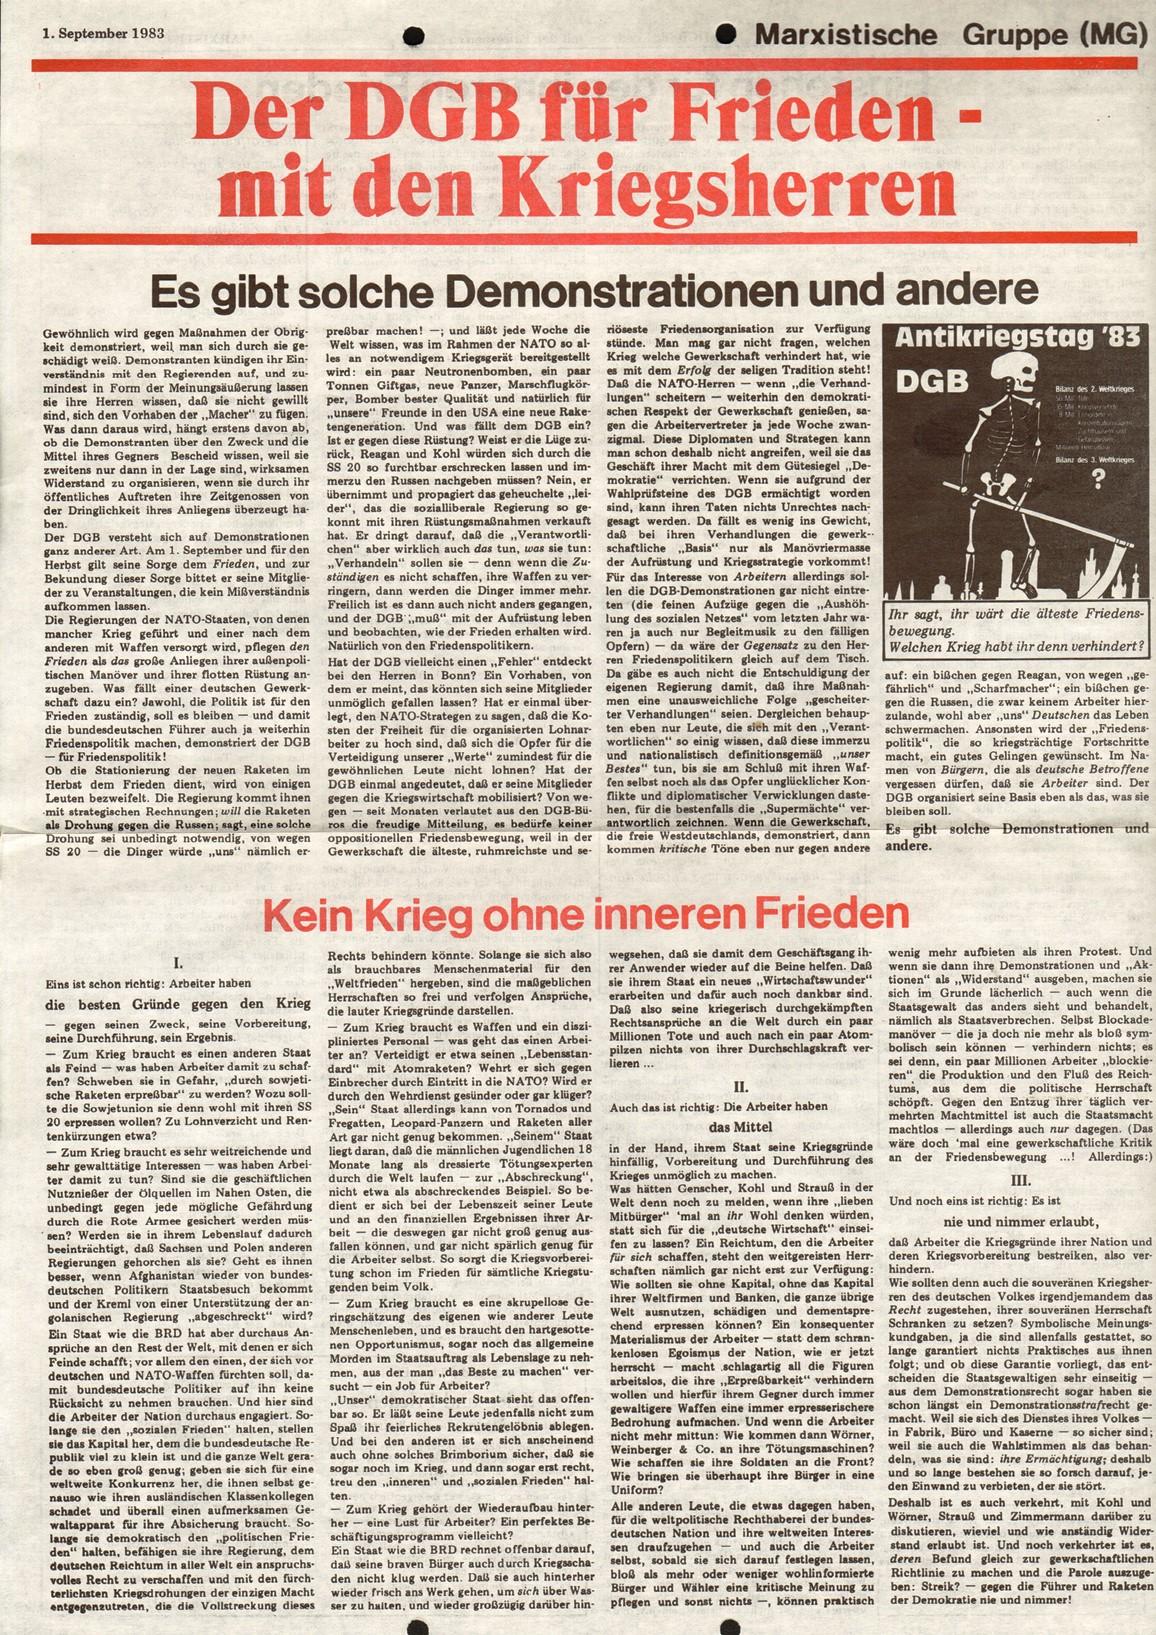 Berlin_MG_FB_19830901_01